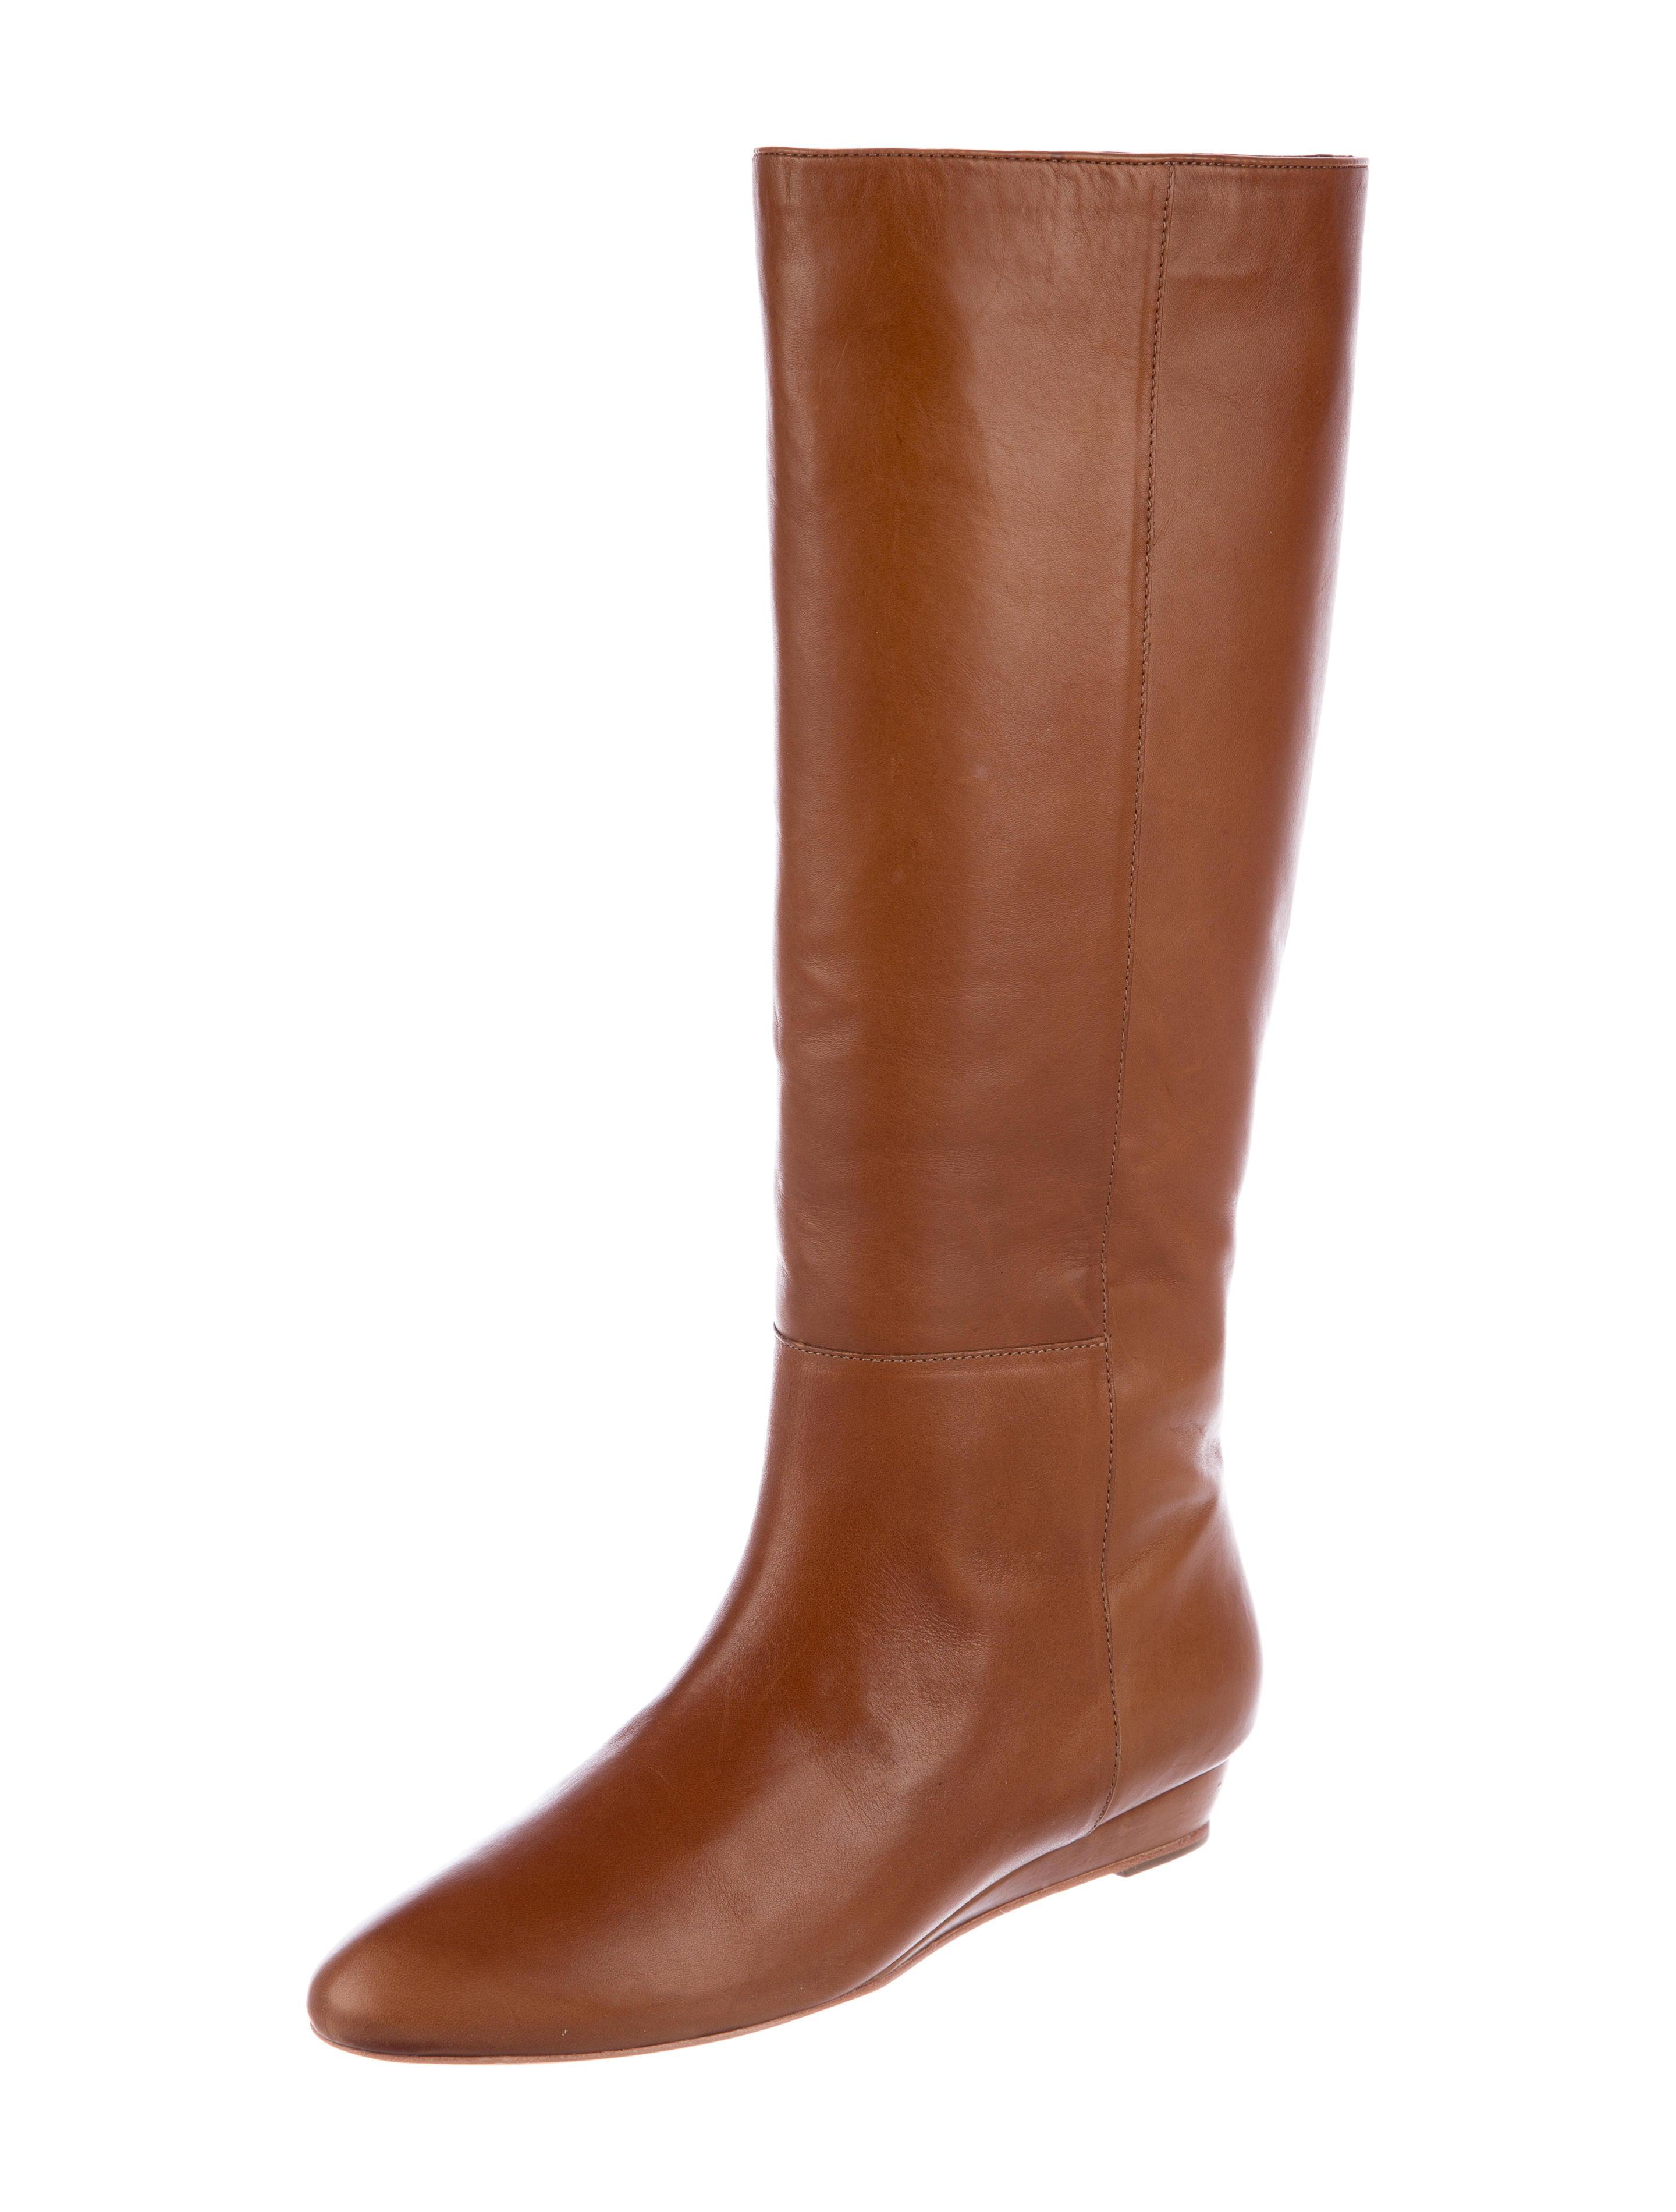 Loeffler Randall Leather Round-Toe Knee-High Boots cheap 100% original discount footlocker finishline 7i9wD